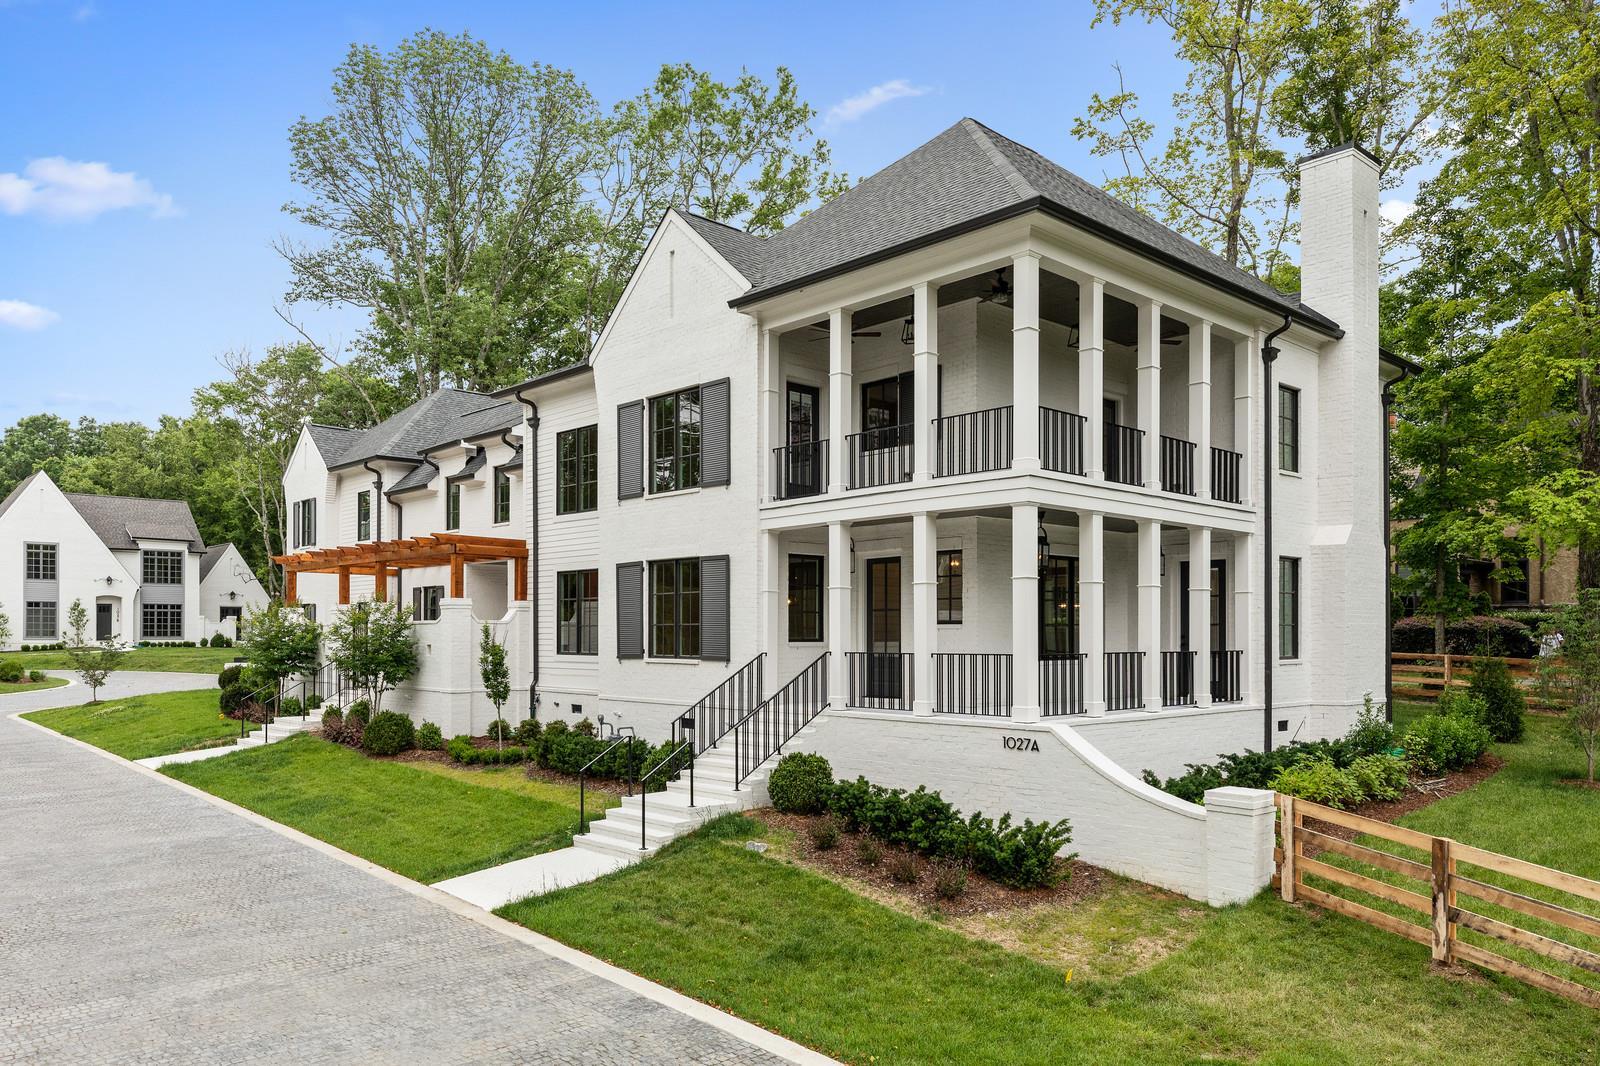 1027A Battery Ln, Nashville, TN 37220 - Nashville, TN real estate listing